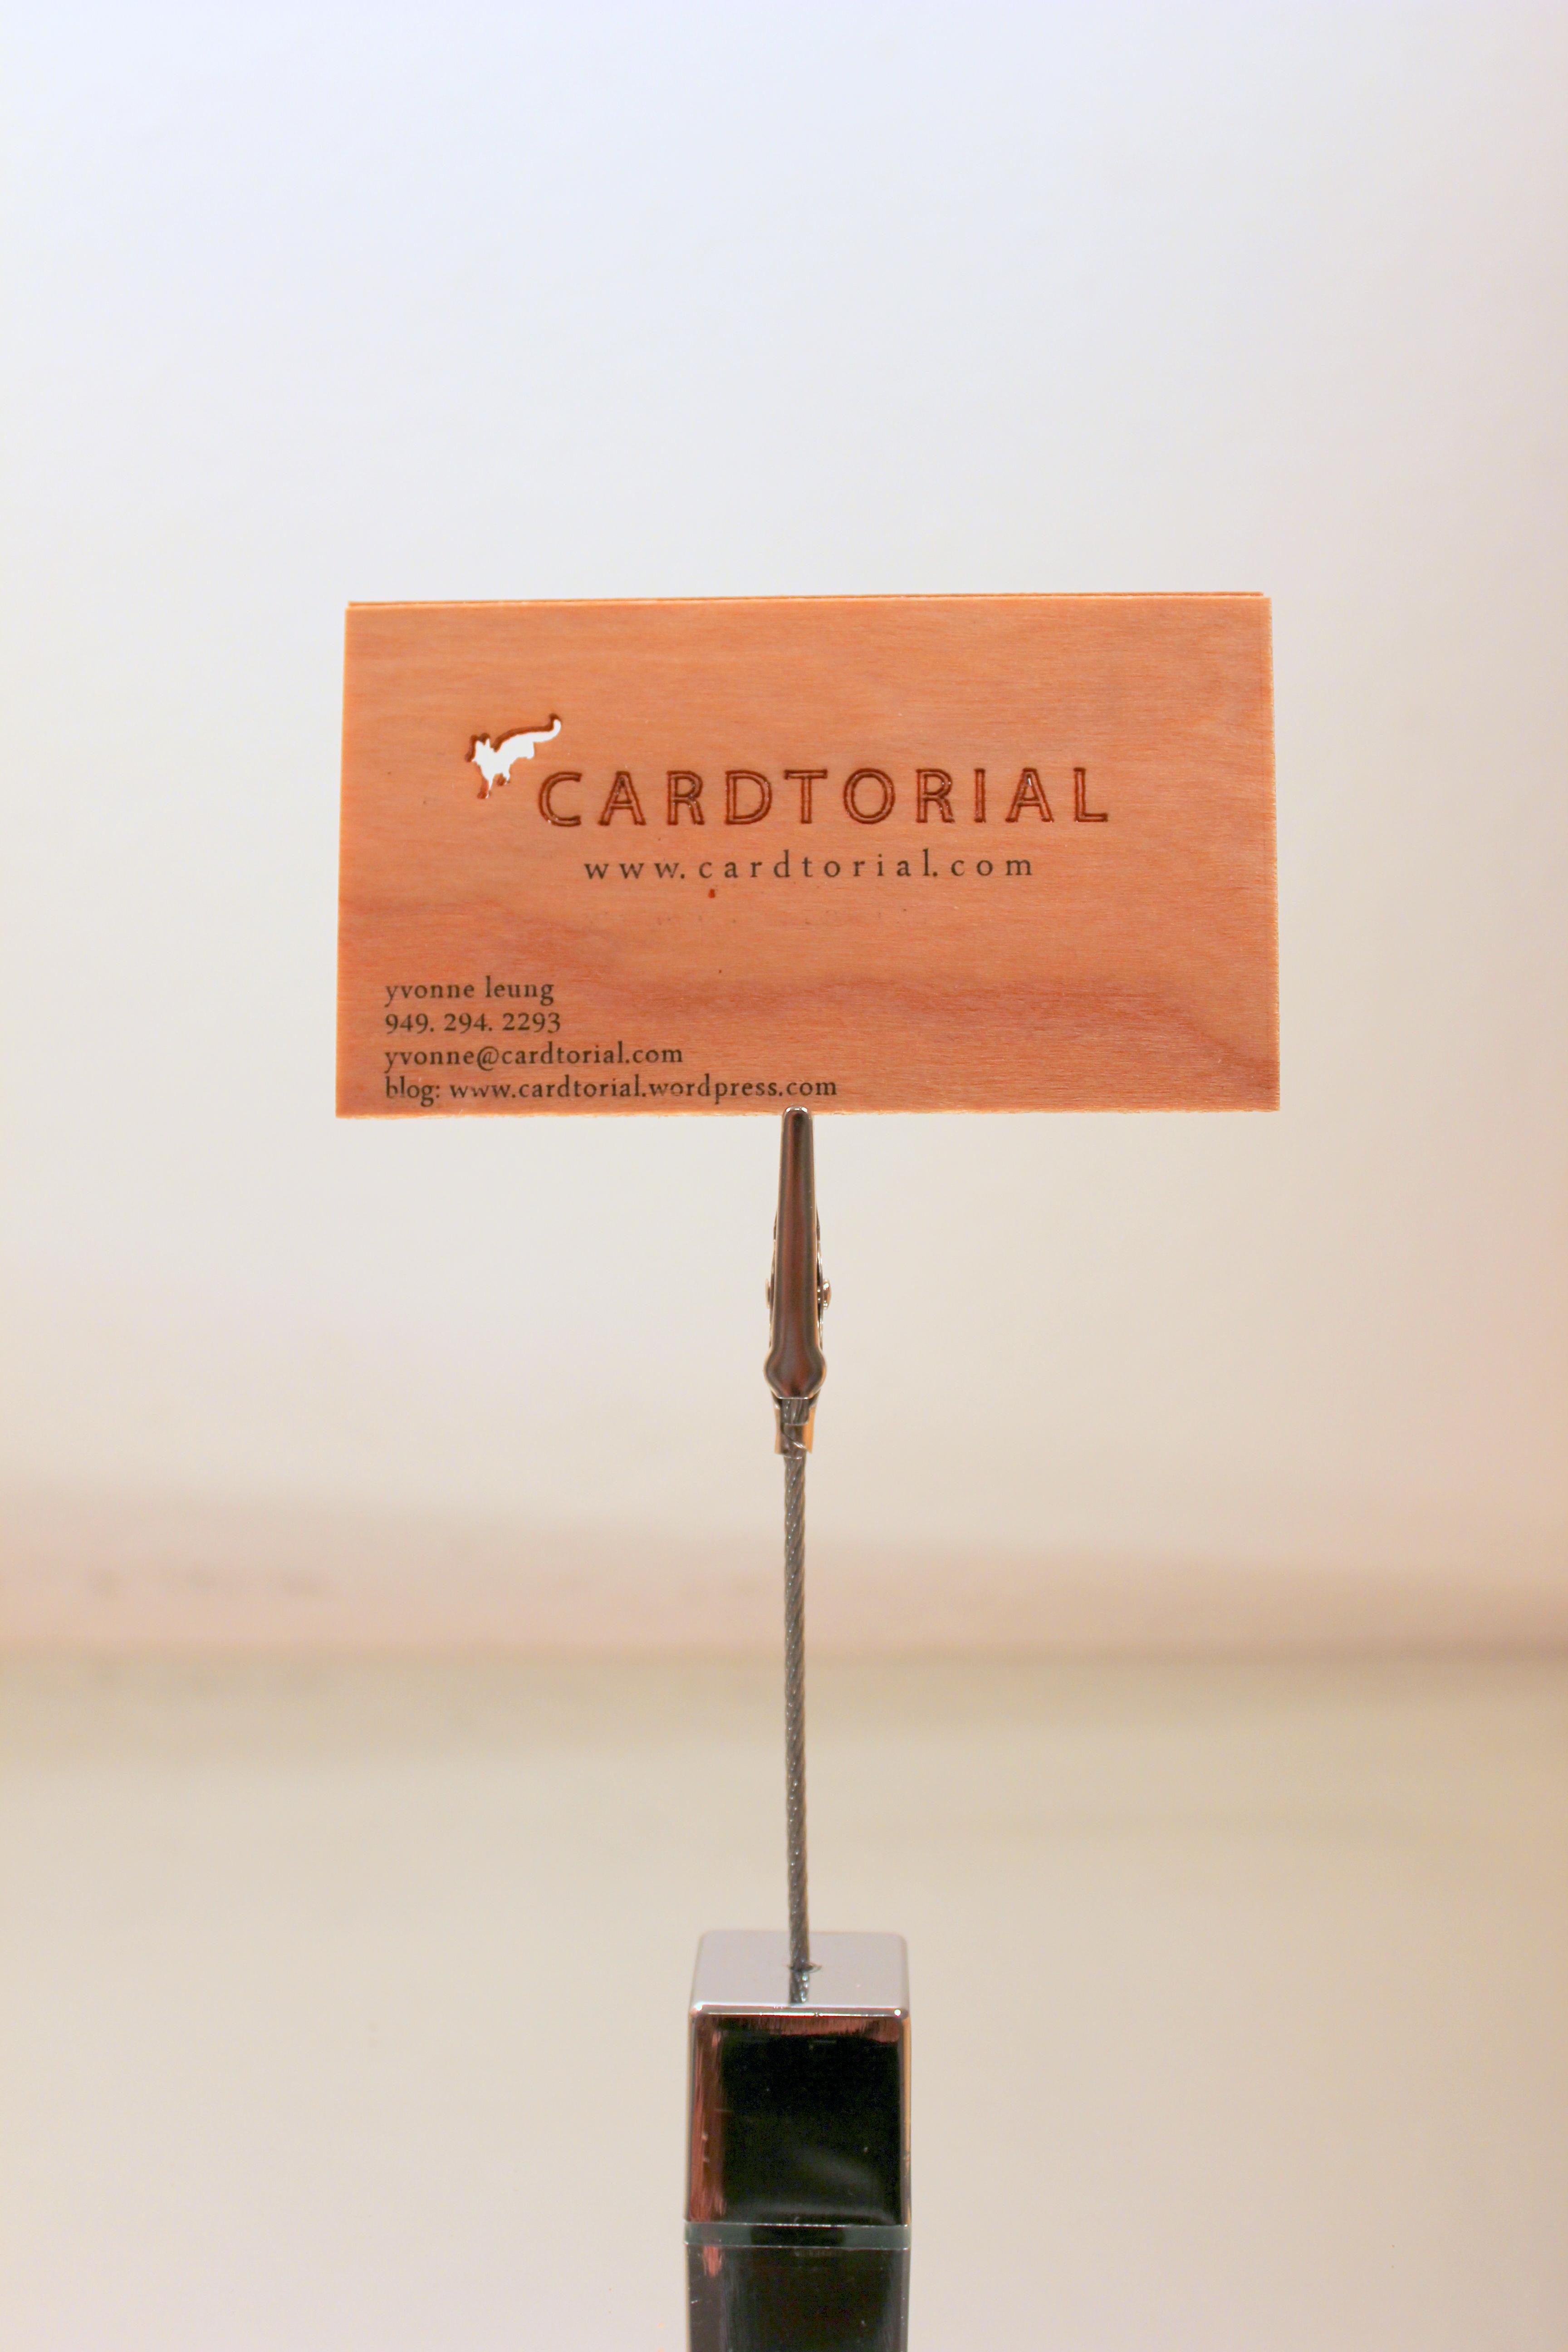 Cardtorial wood veneer laser cut business cards colourmoves